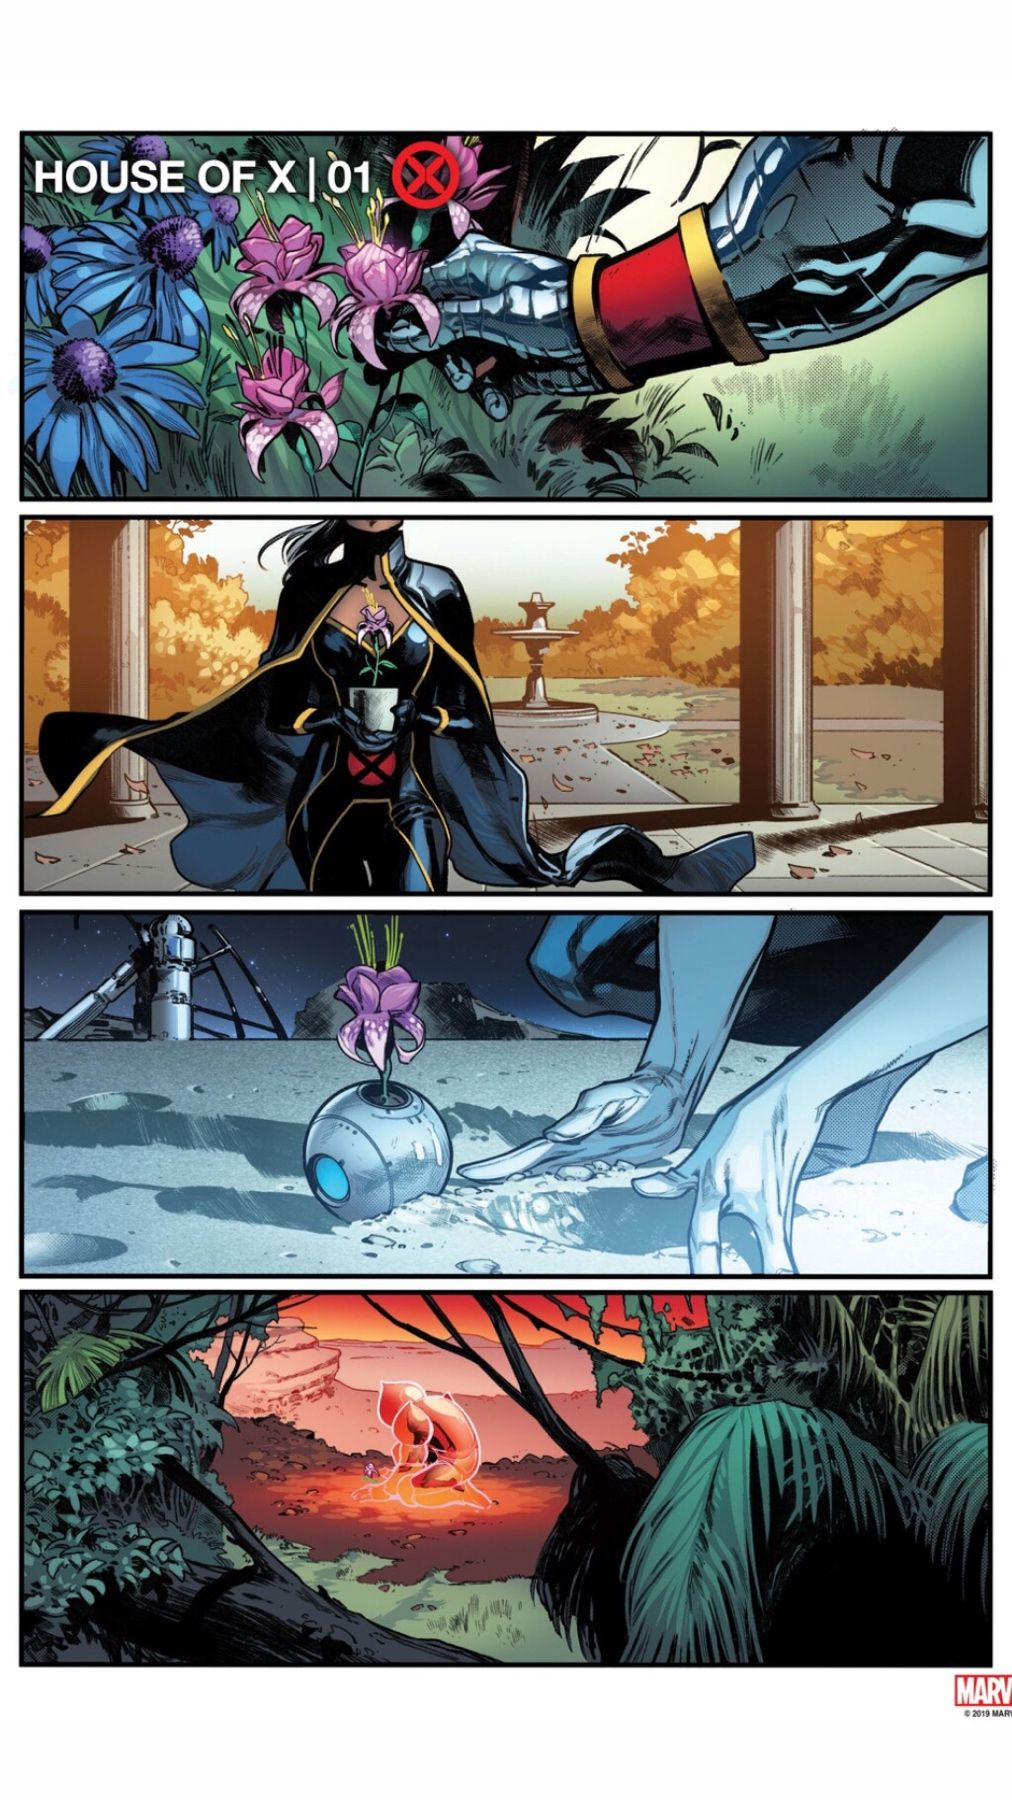 House Of X 1 Artwork Xmen Comics X Men Comic Book Layout